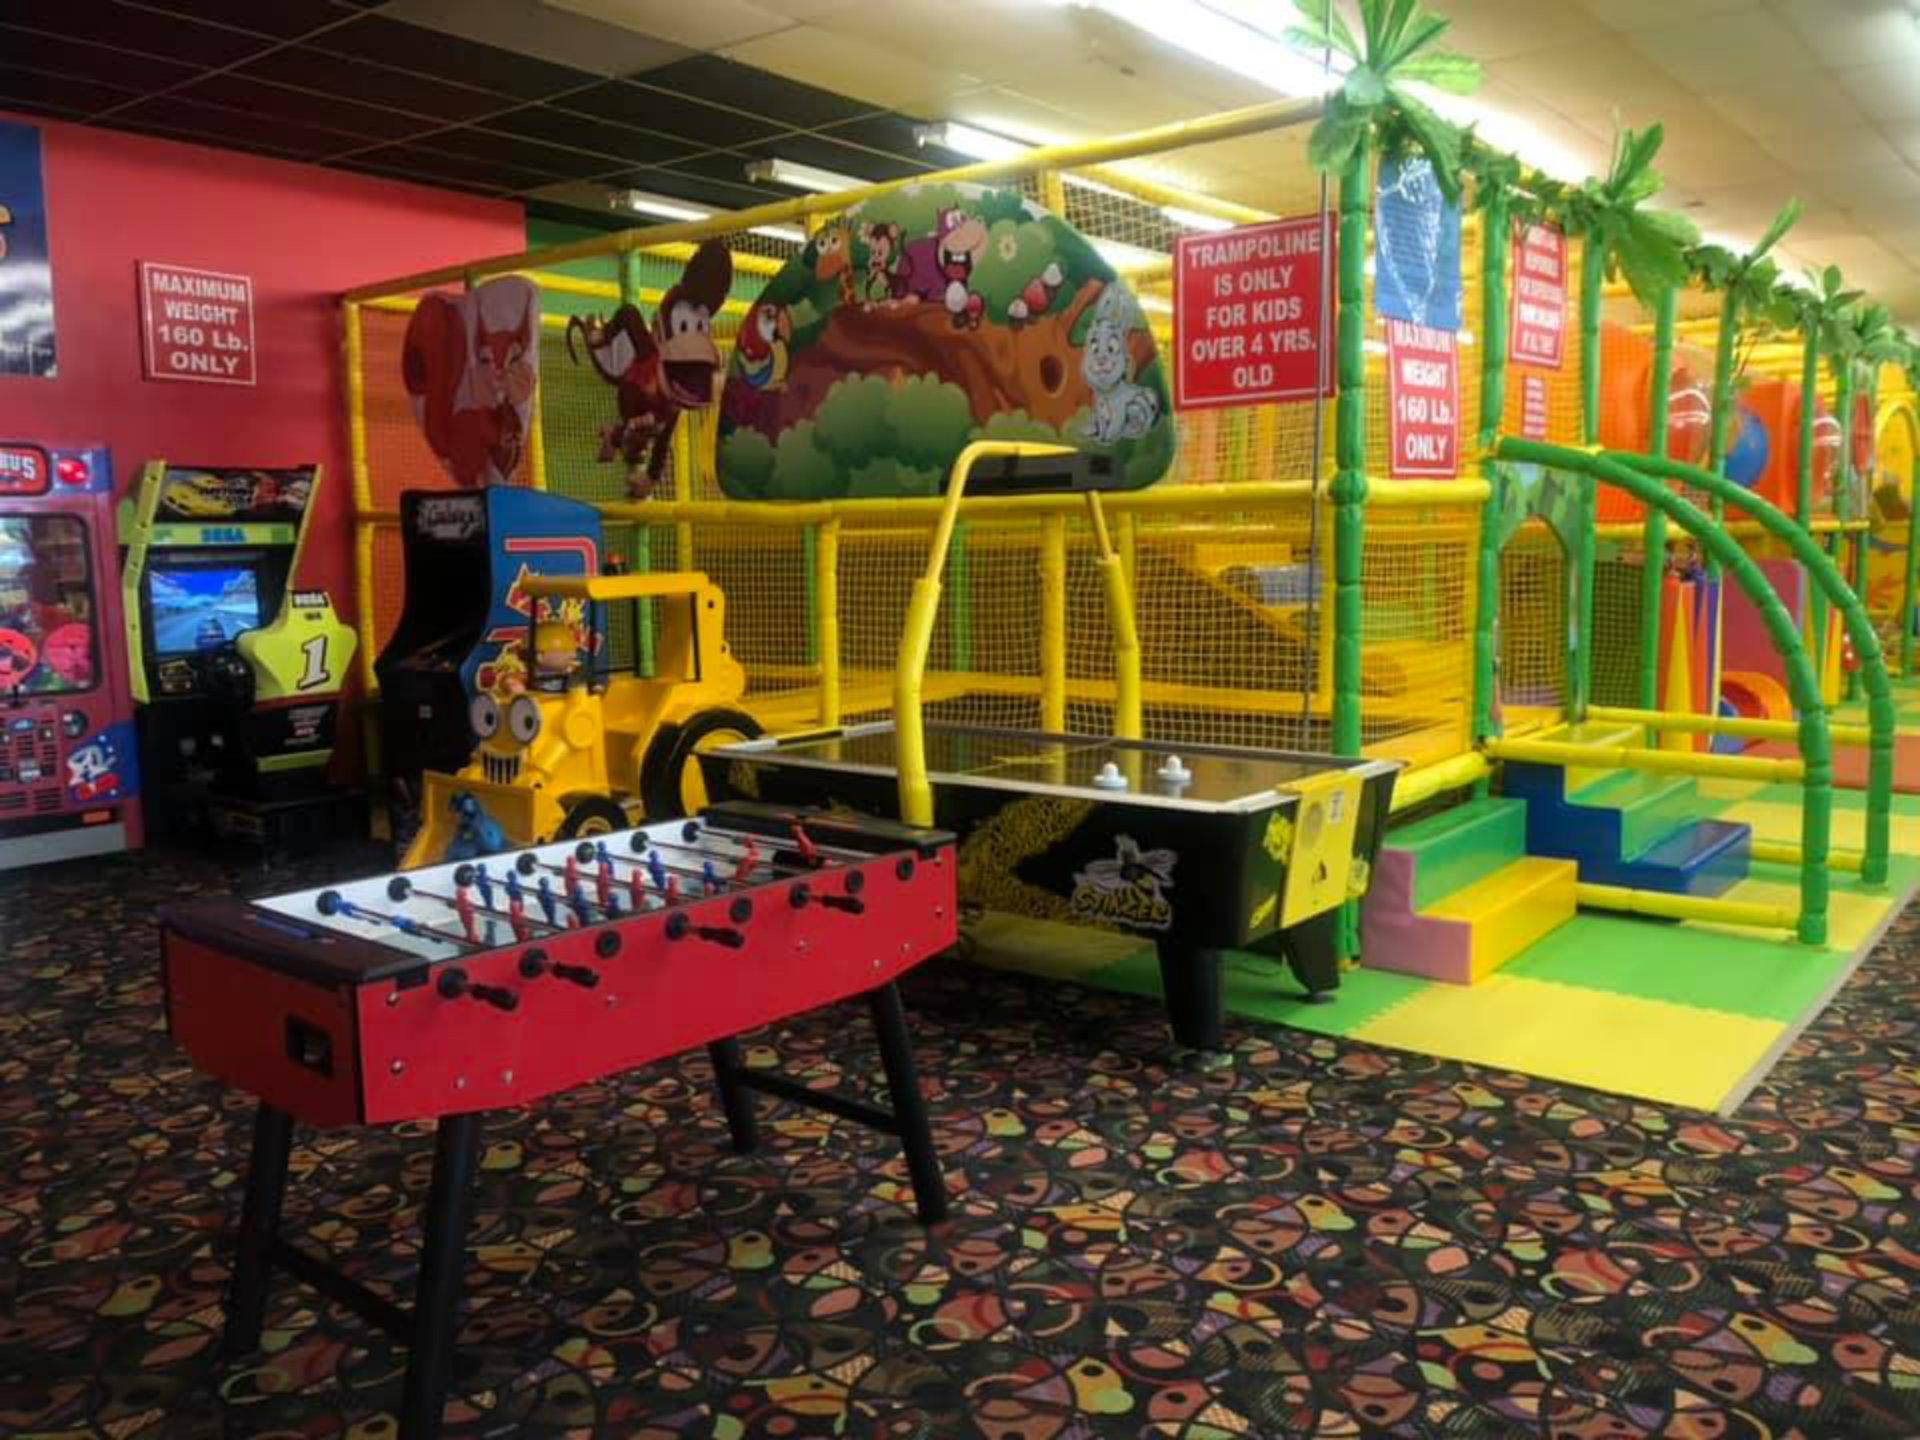 Yoyo's Family Fun Centre - Tourism Windsor Essex Pelee Island